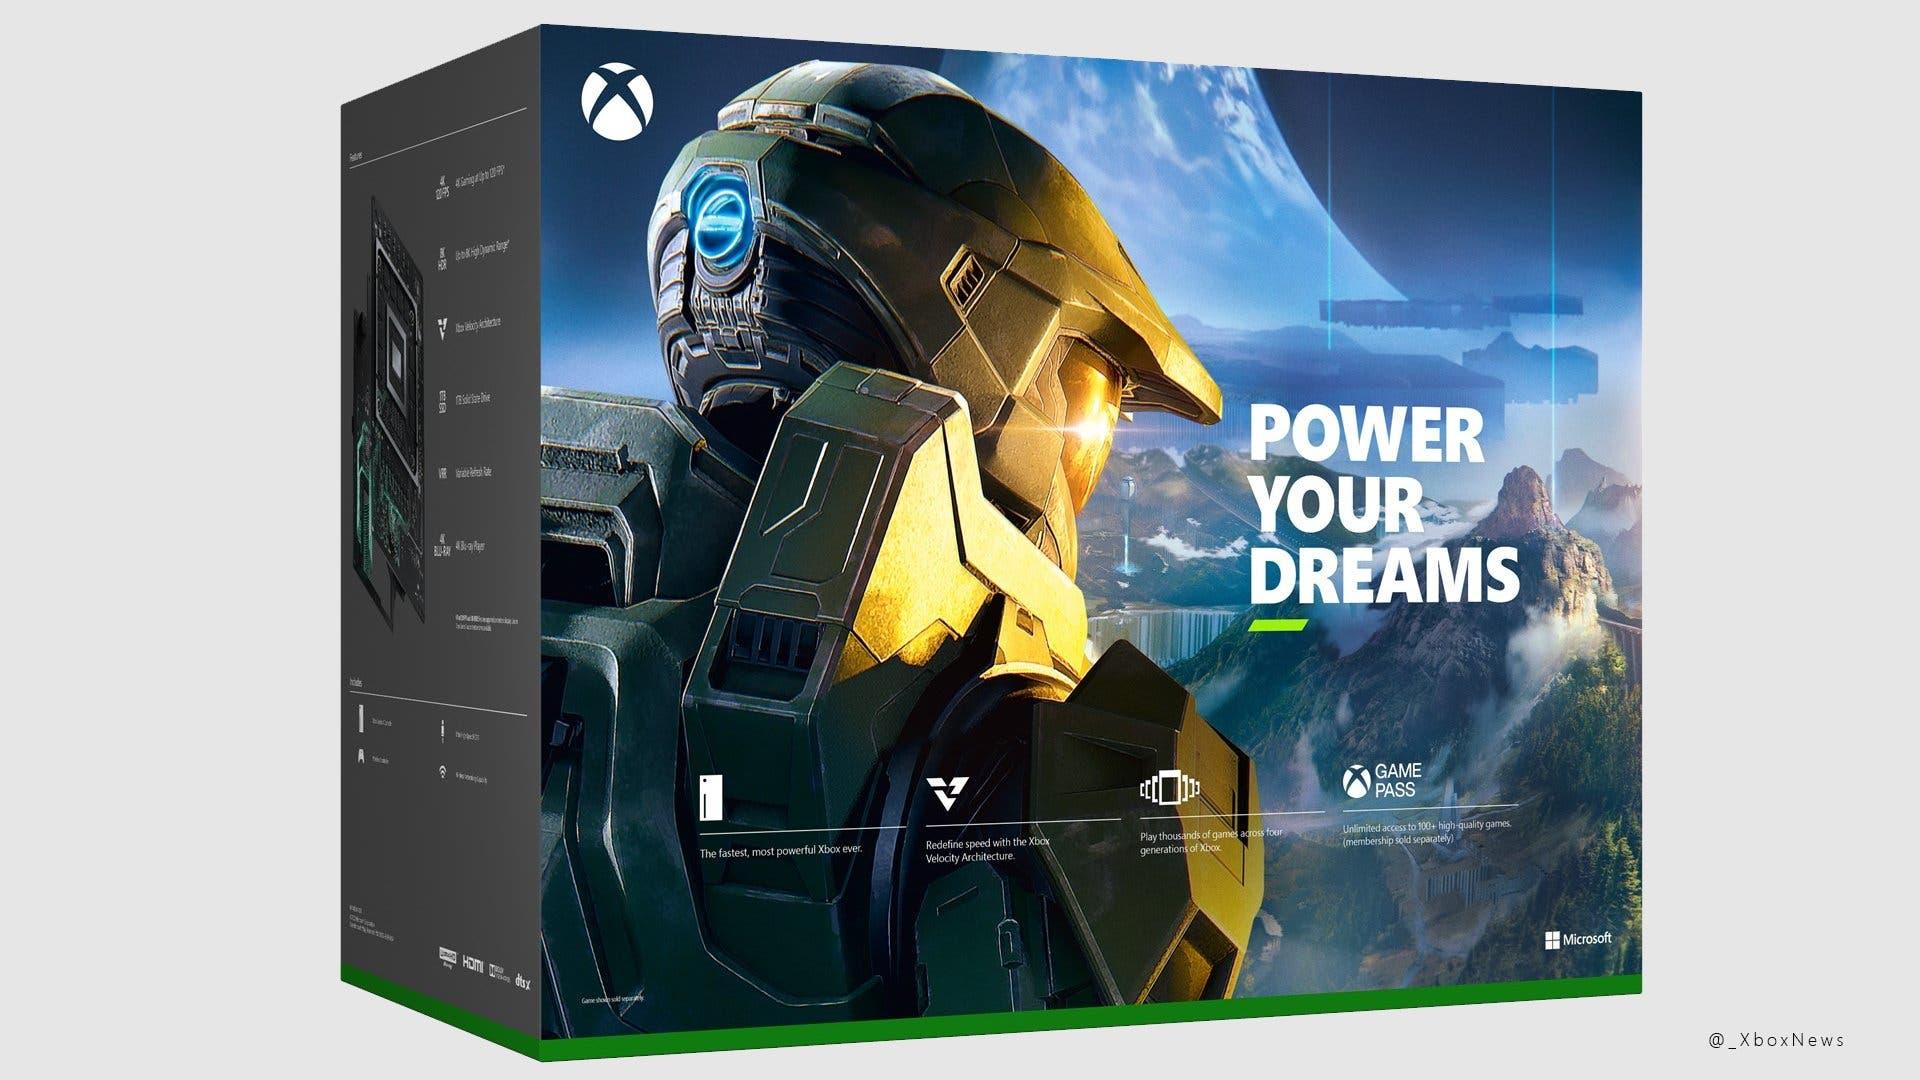 Halo Infinite aparece en la parte trasera de la caja de Xbox Series X